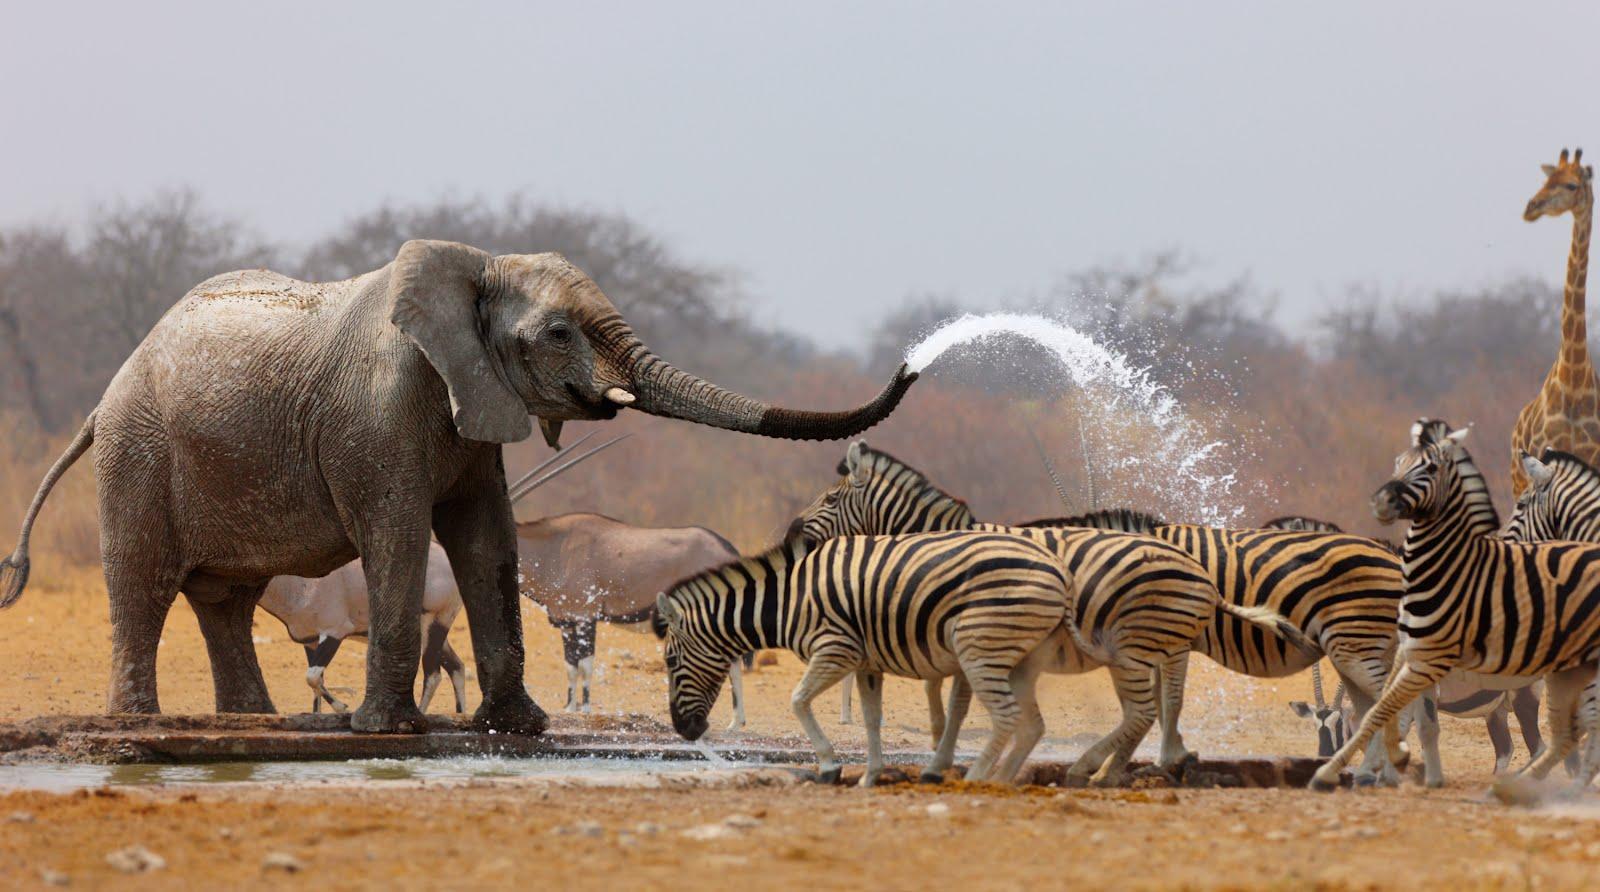 http://2.bp.blogspot.com/-DcIoiDfw5f8/UG5GcZxkleI/AAAAAAABKw4/dbUOlkH-t7c/s1600/elefante-y-cebras-animales-de-la-sabana-.jpg